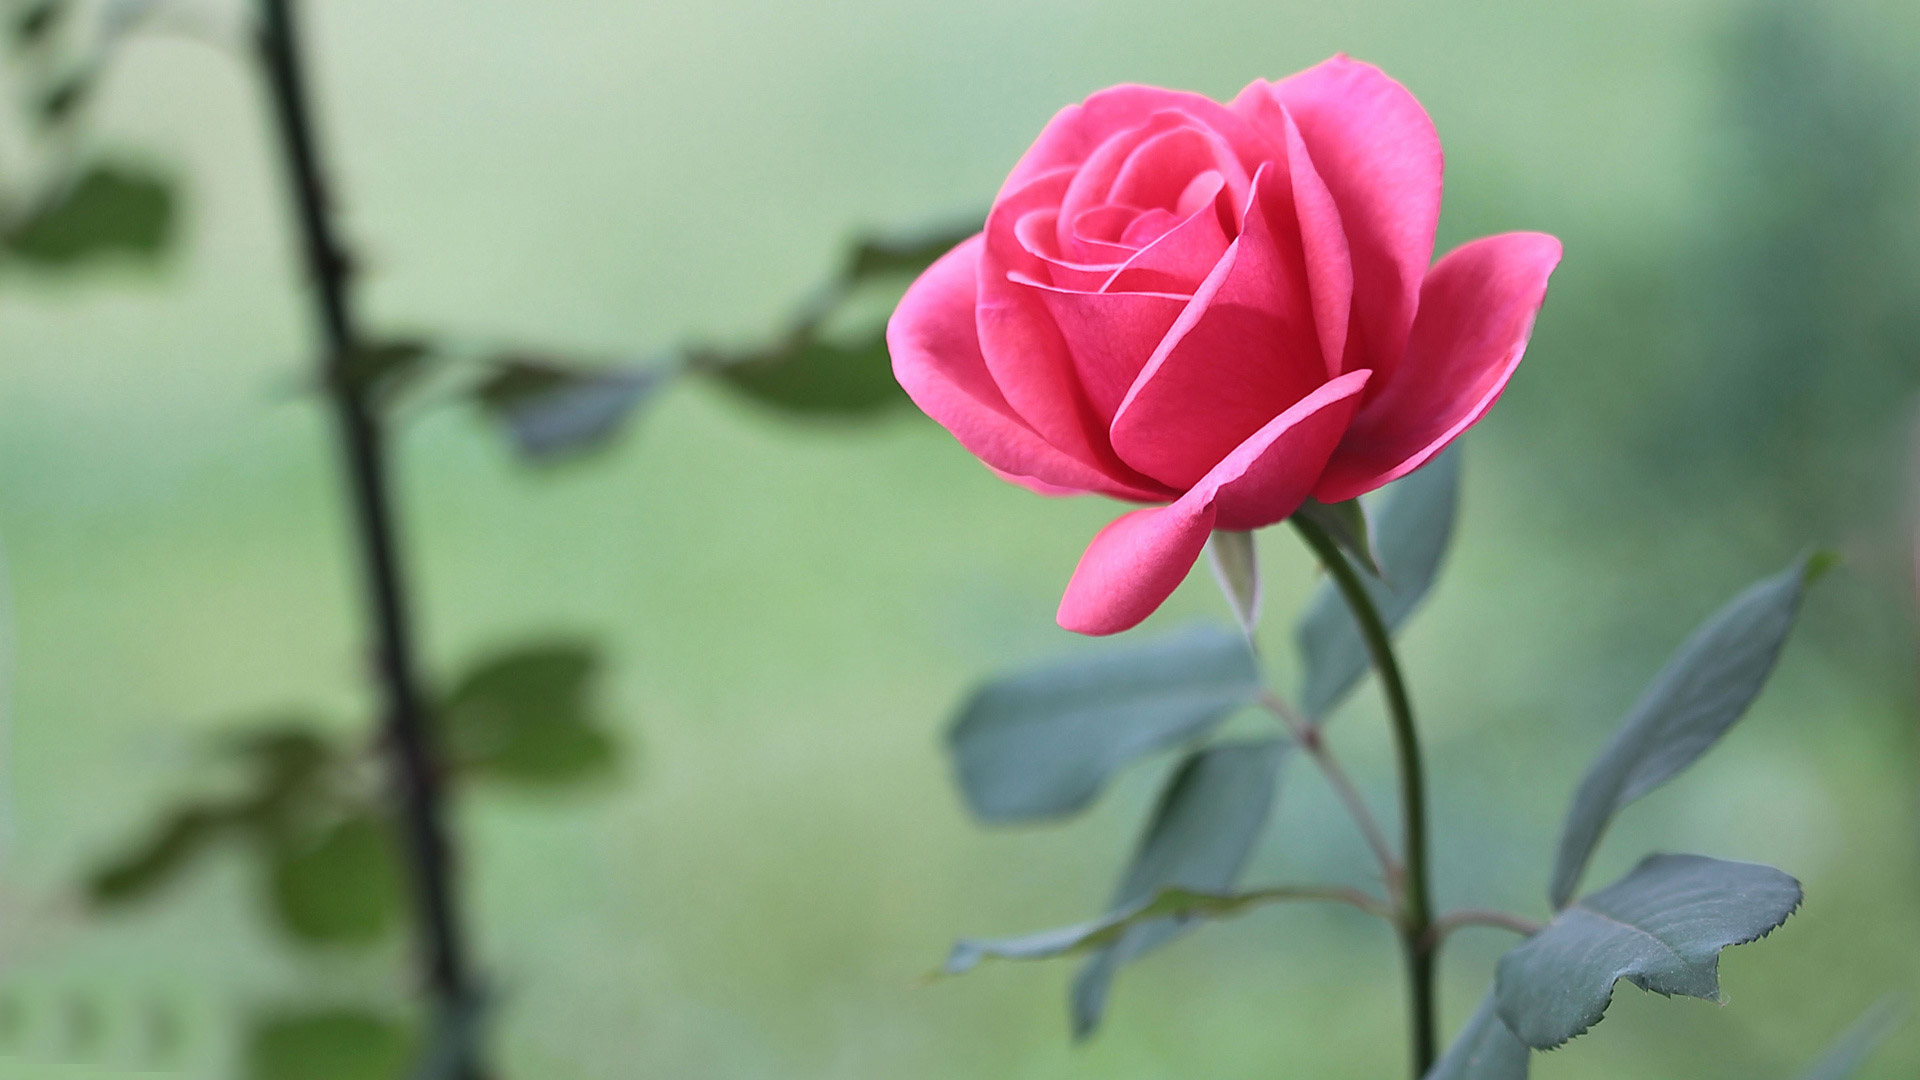 Pink Rose Wallpaper Hd 46814 1920x1080px